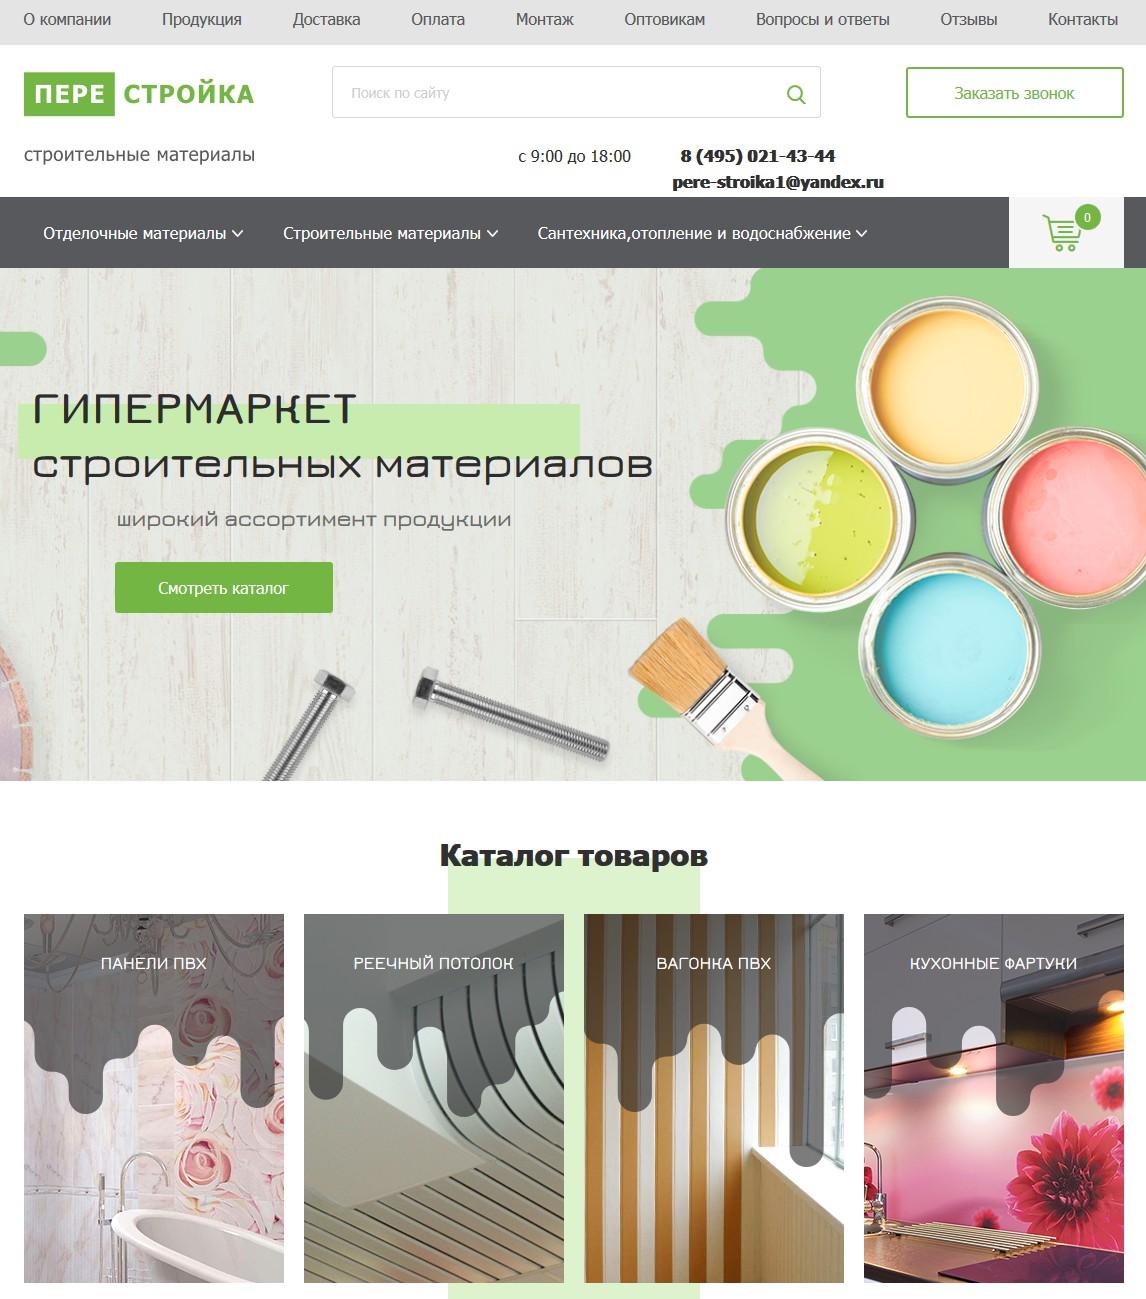 Pere-stroika.ru